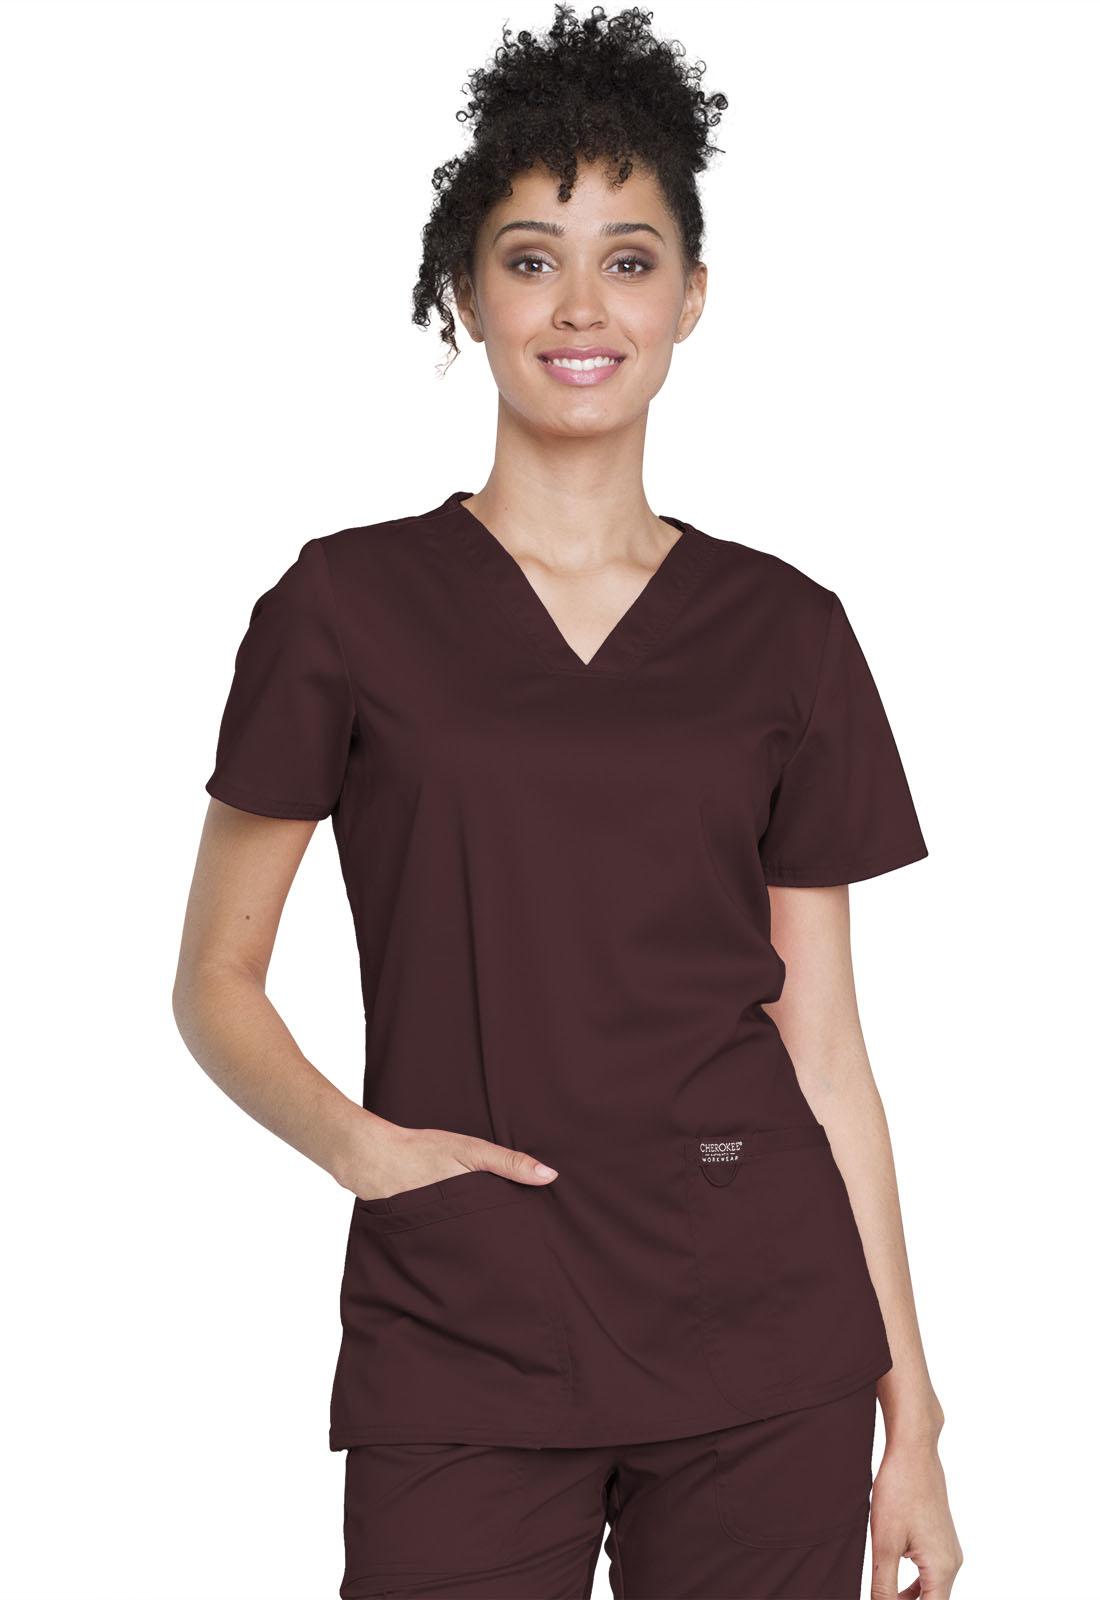 0842ed6f50d WW Revolution V-Neck Top in Espresso WW620-ESP from Scrubs Etc Medical  Uniforms